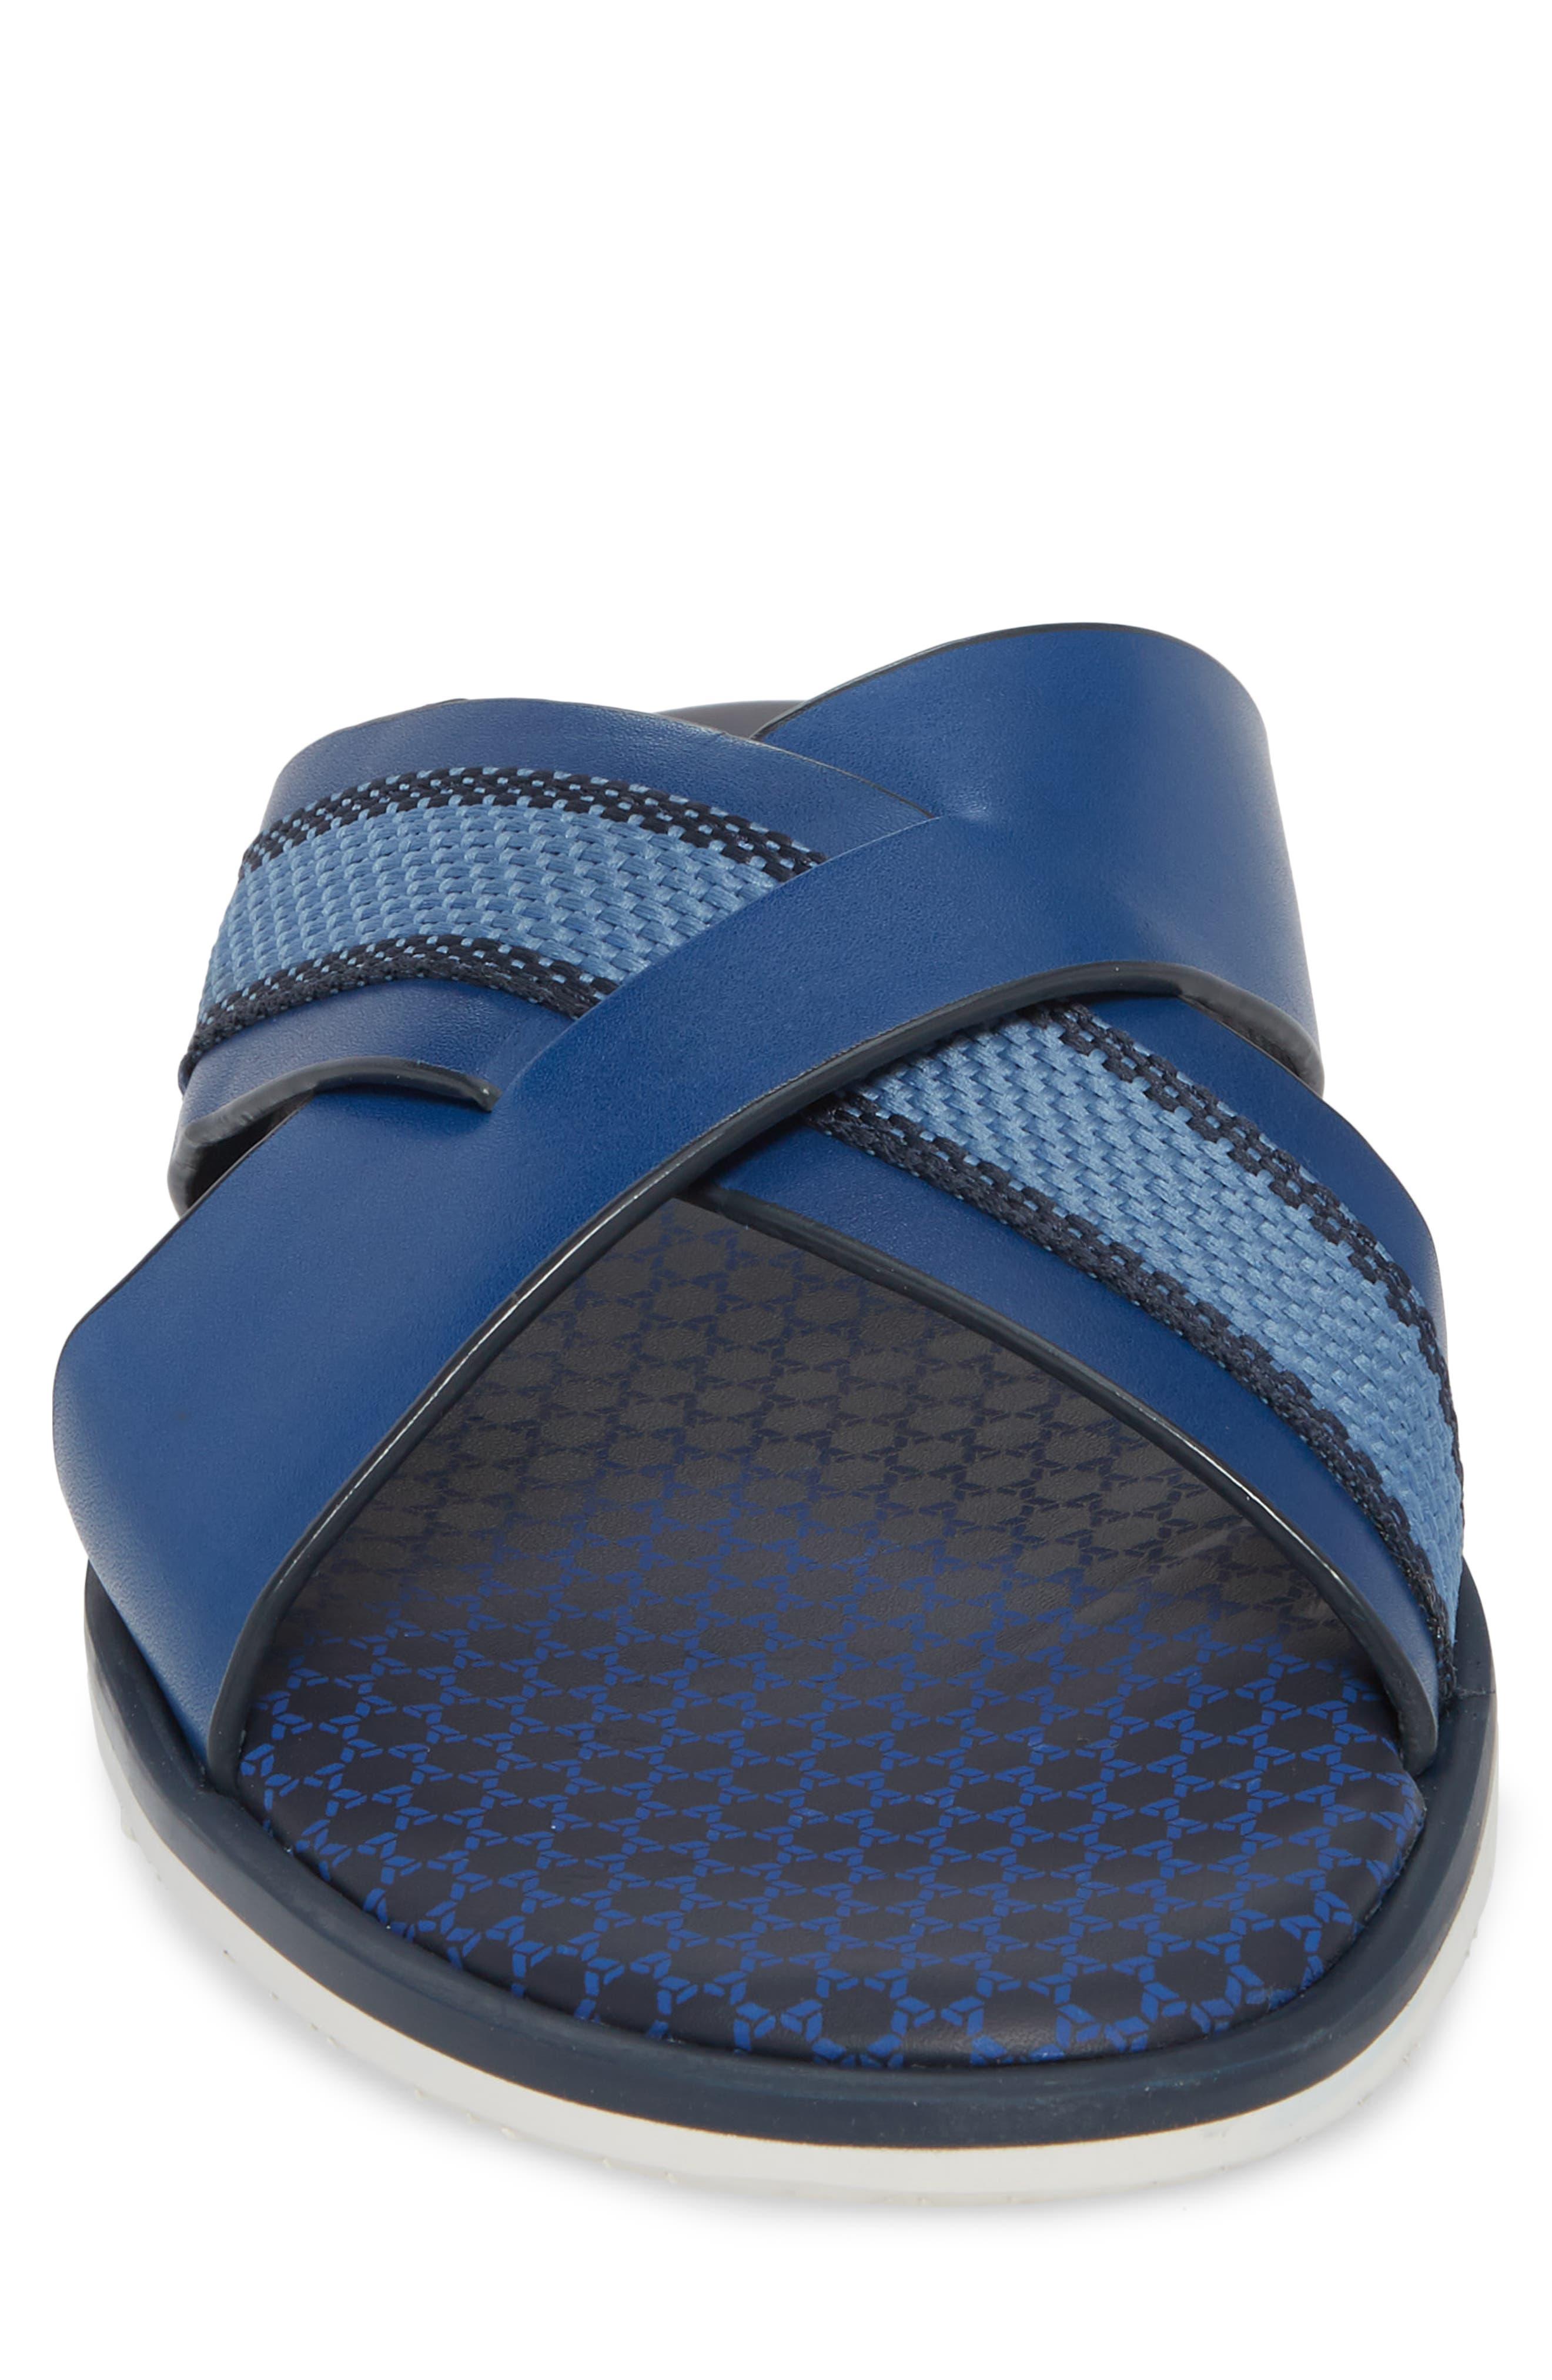 Farrull Cross Strap Slide Sandal,                             Alternate thumbnail 4, color,                             BLUE LEATHER/TEXTILE